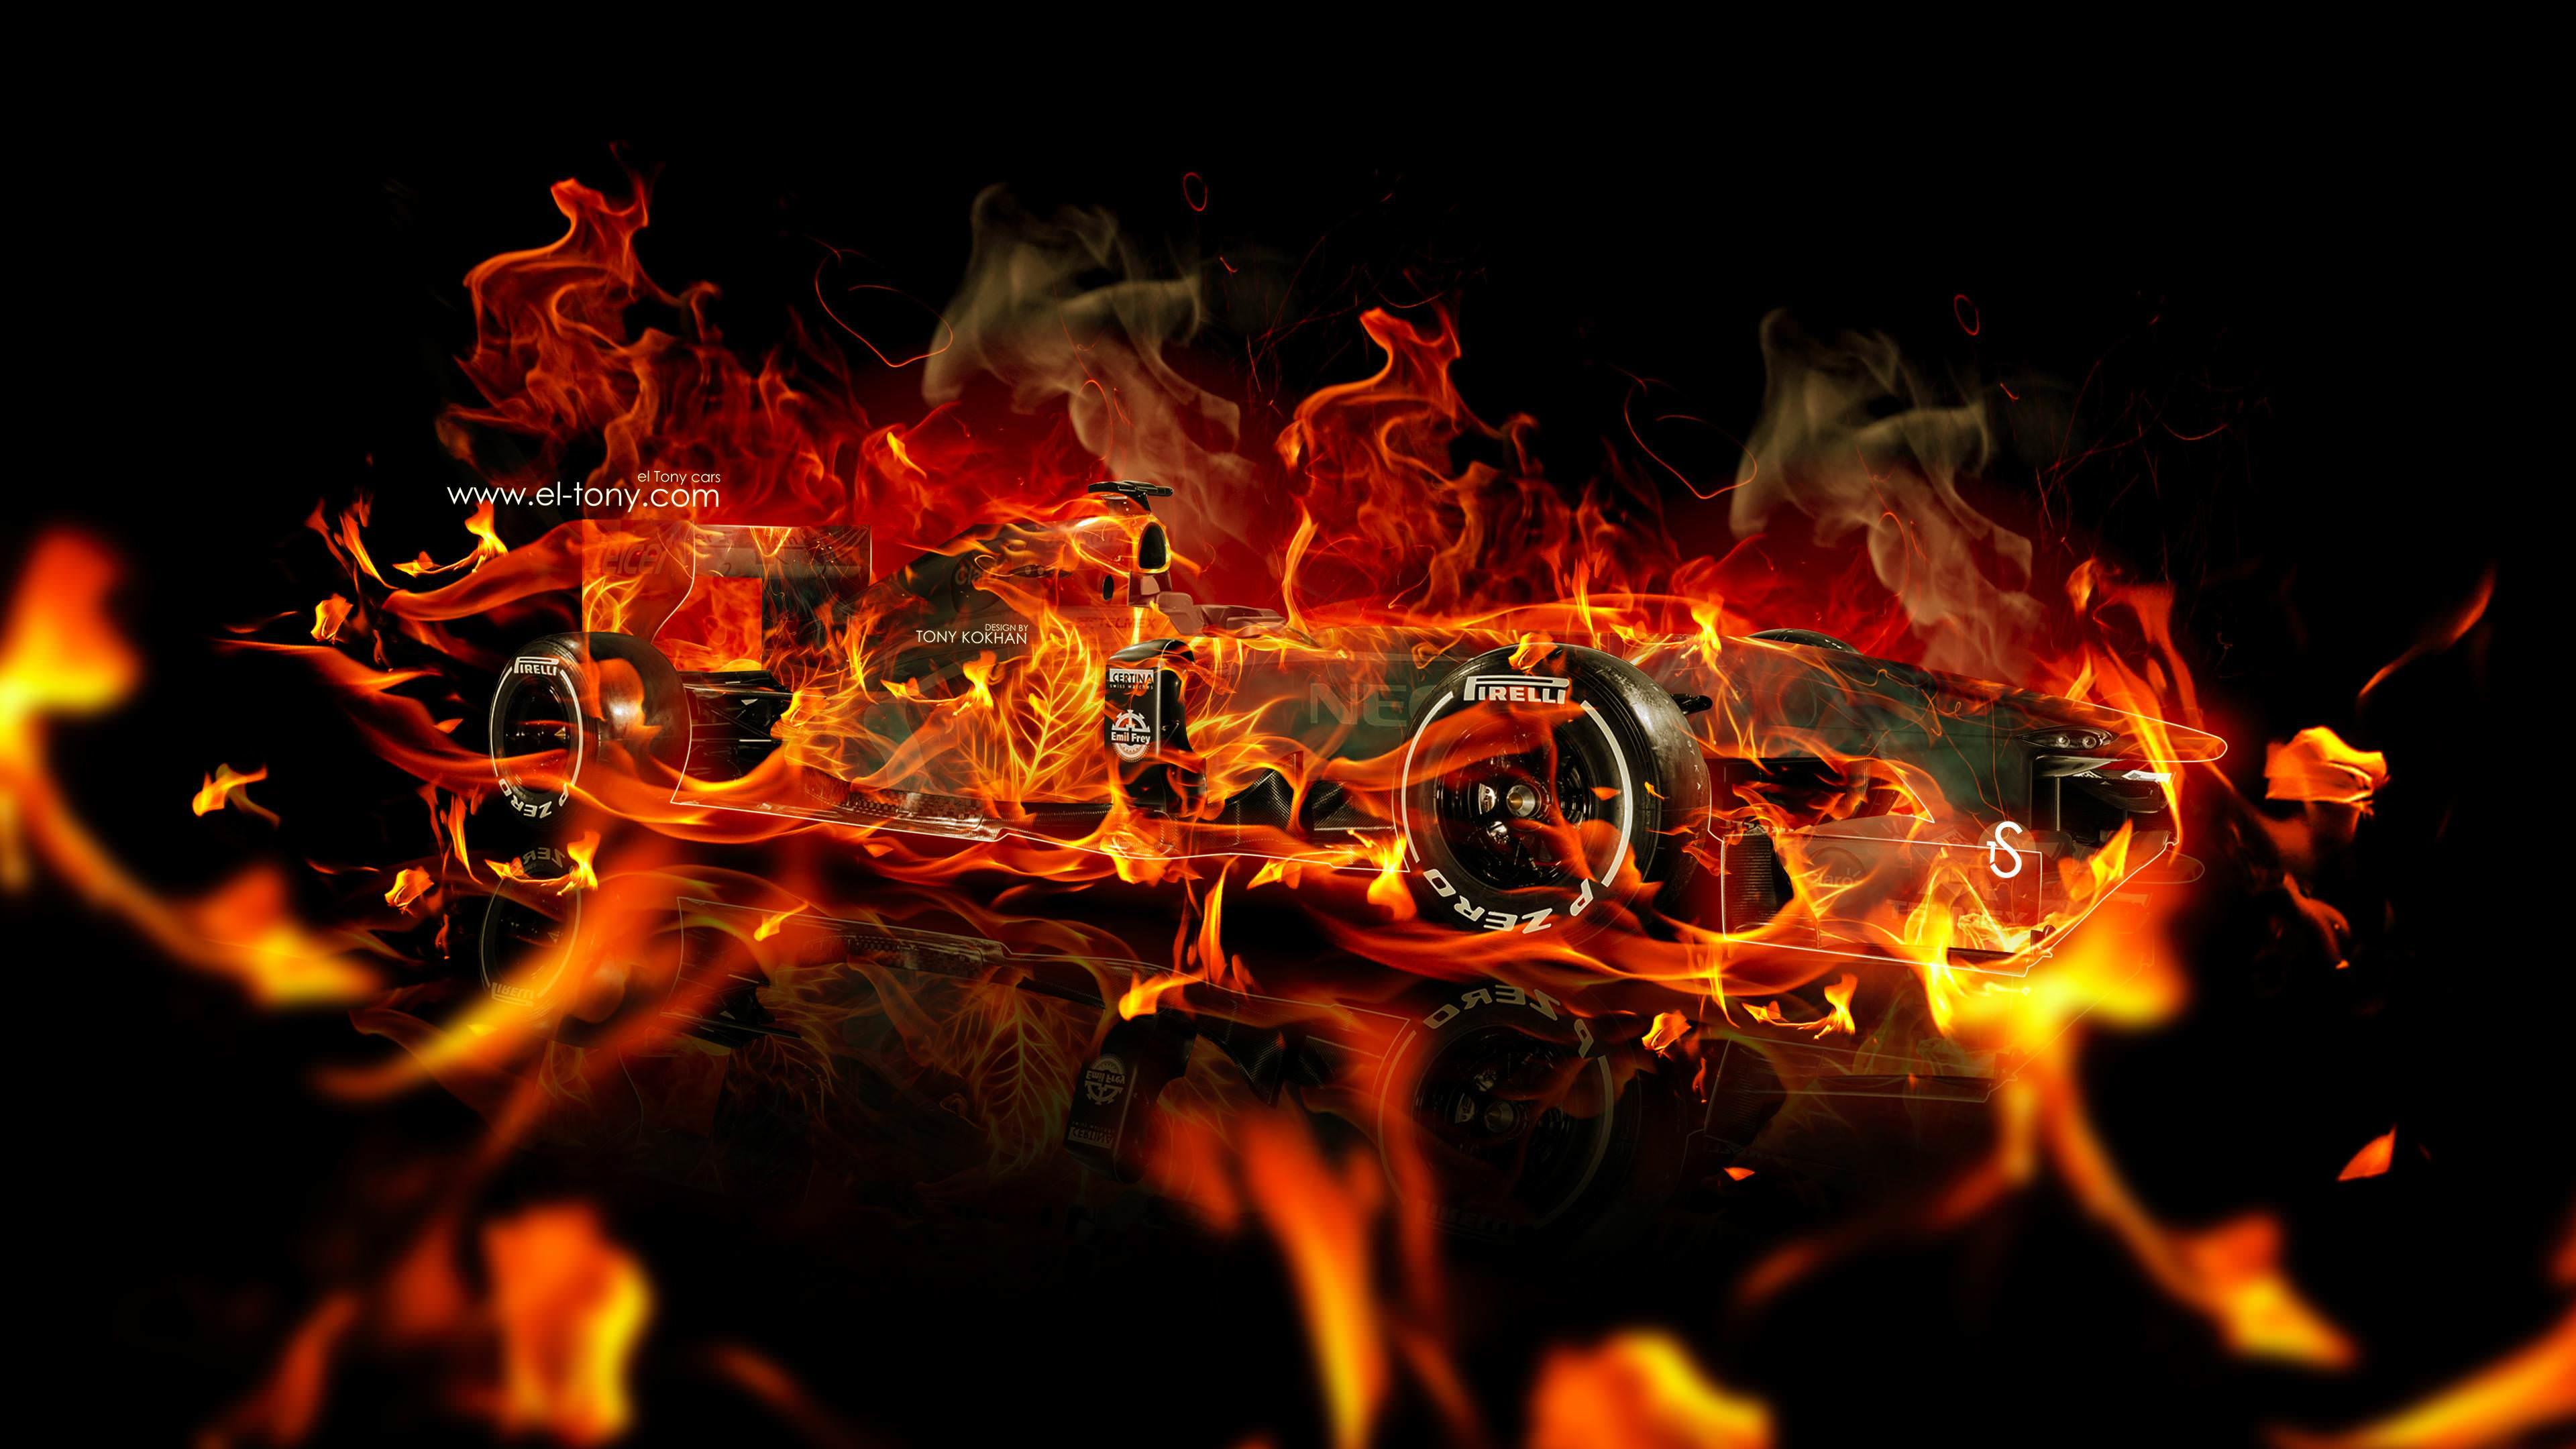 4k Fire Wallpapers Top Free 4k Fire Backgrounds Wallpaperaccess